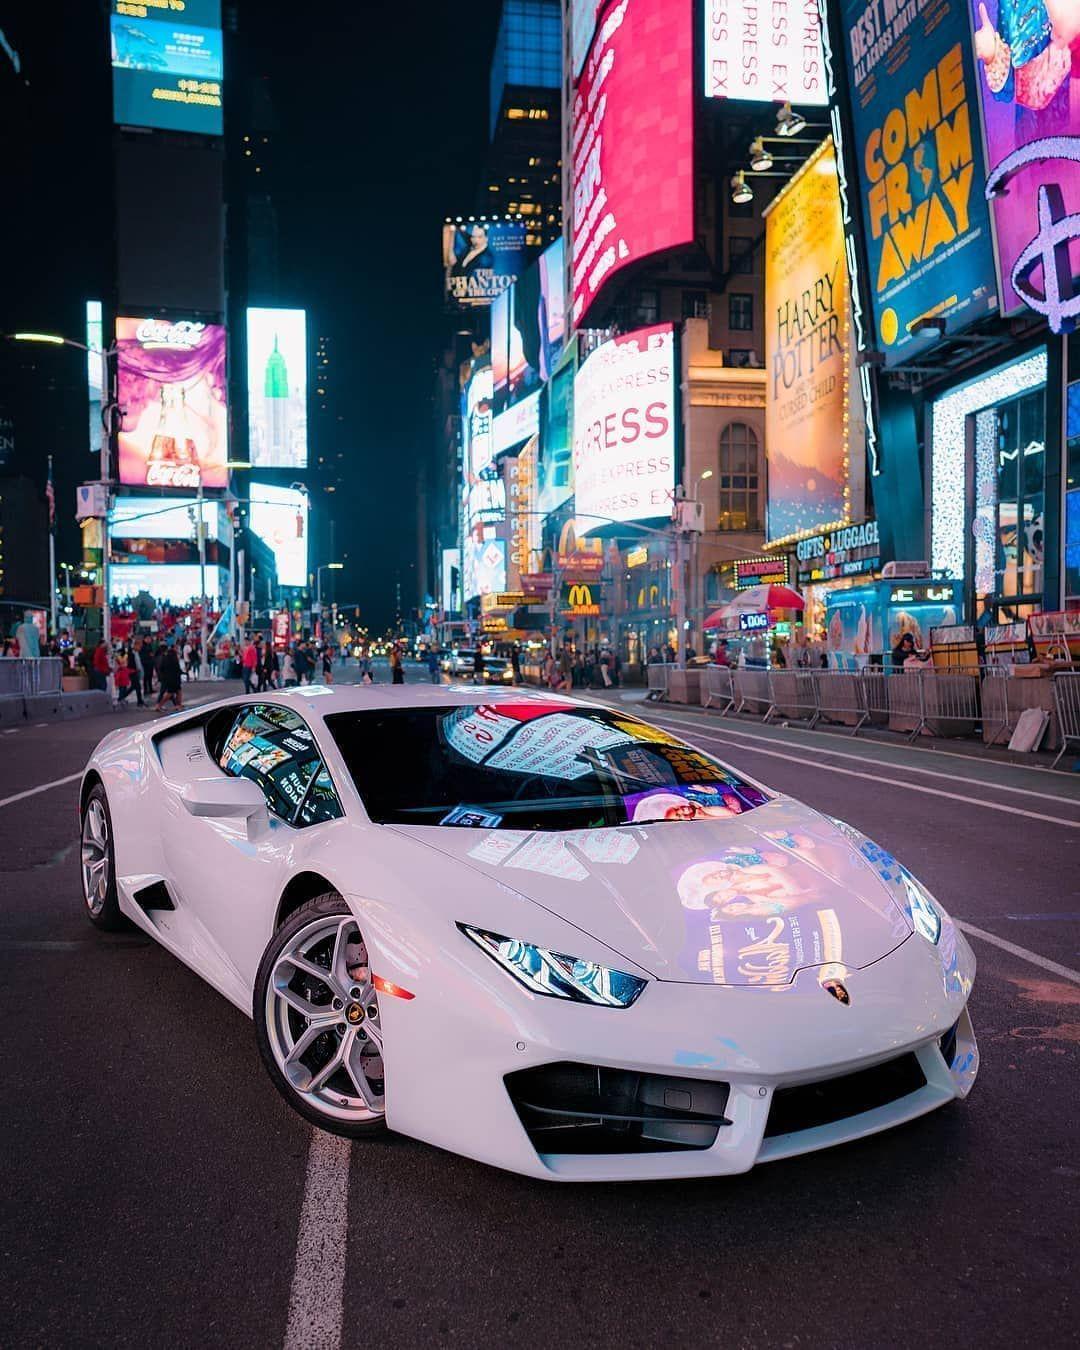 Lamborghini Huracan In New York Follow Speed Crc For More Street Racing Cars Best Luxury Cars Lamborghini Cars